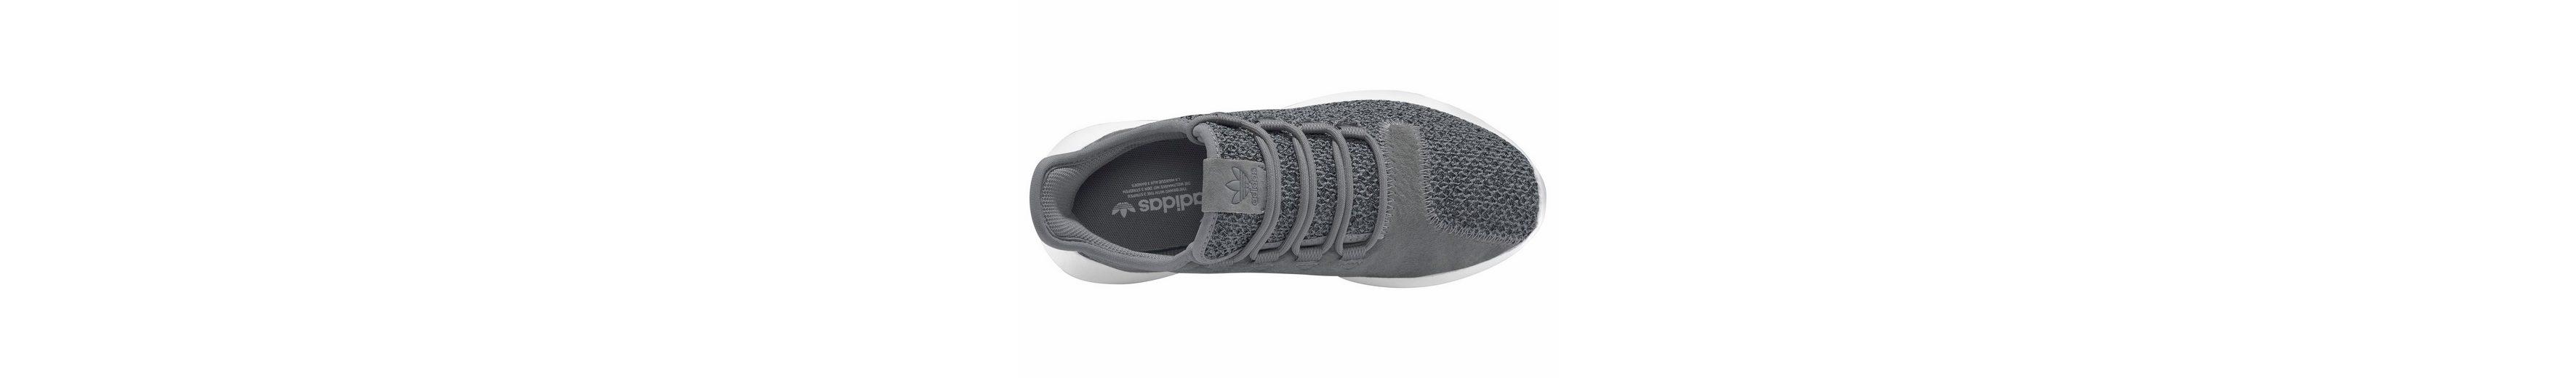 adidas Originals Tubular Shadow W Sneaker, Q2